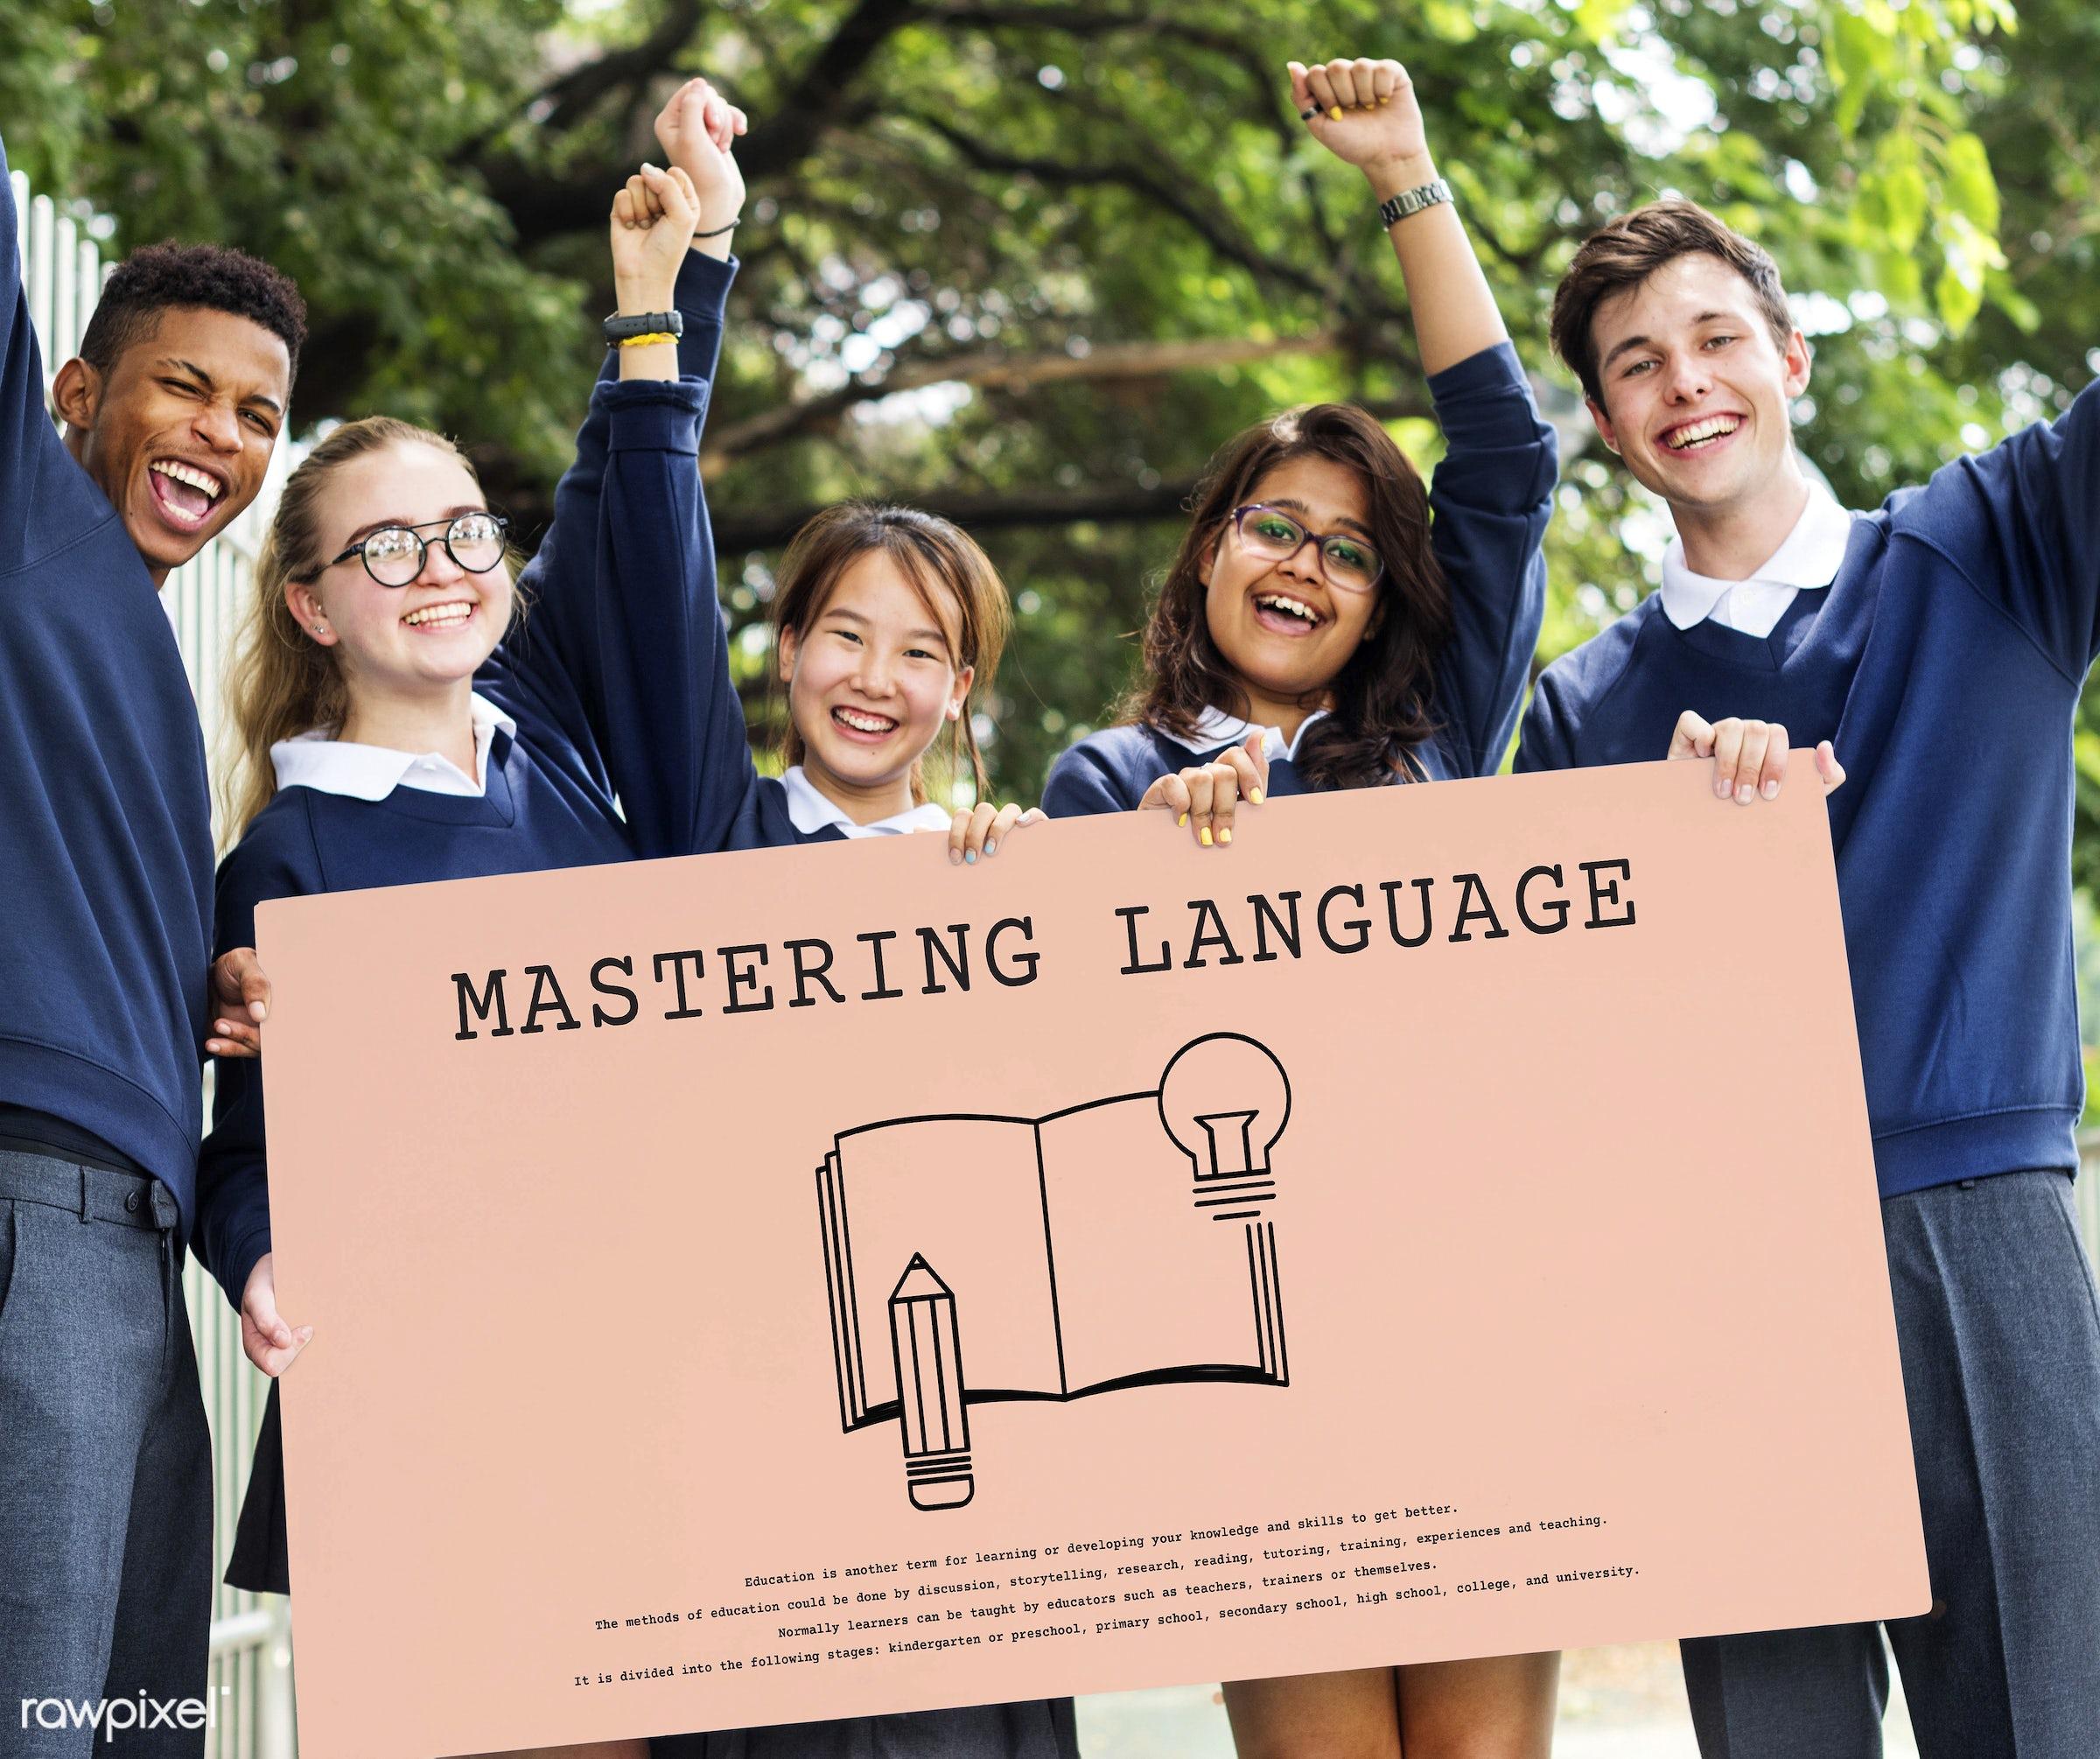 academy, african descent, asian, book, caucasian, communication, comprehension, curriculum, diversity, education, enjoyment...